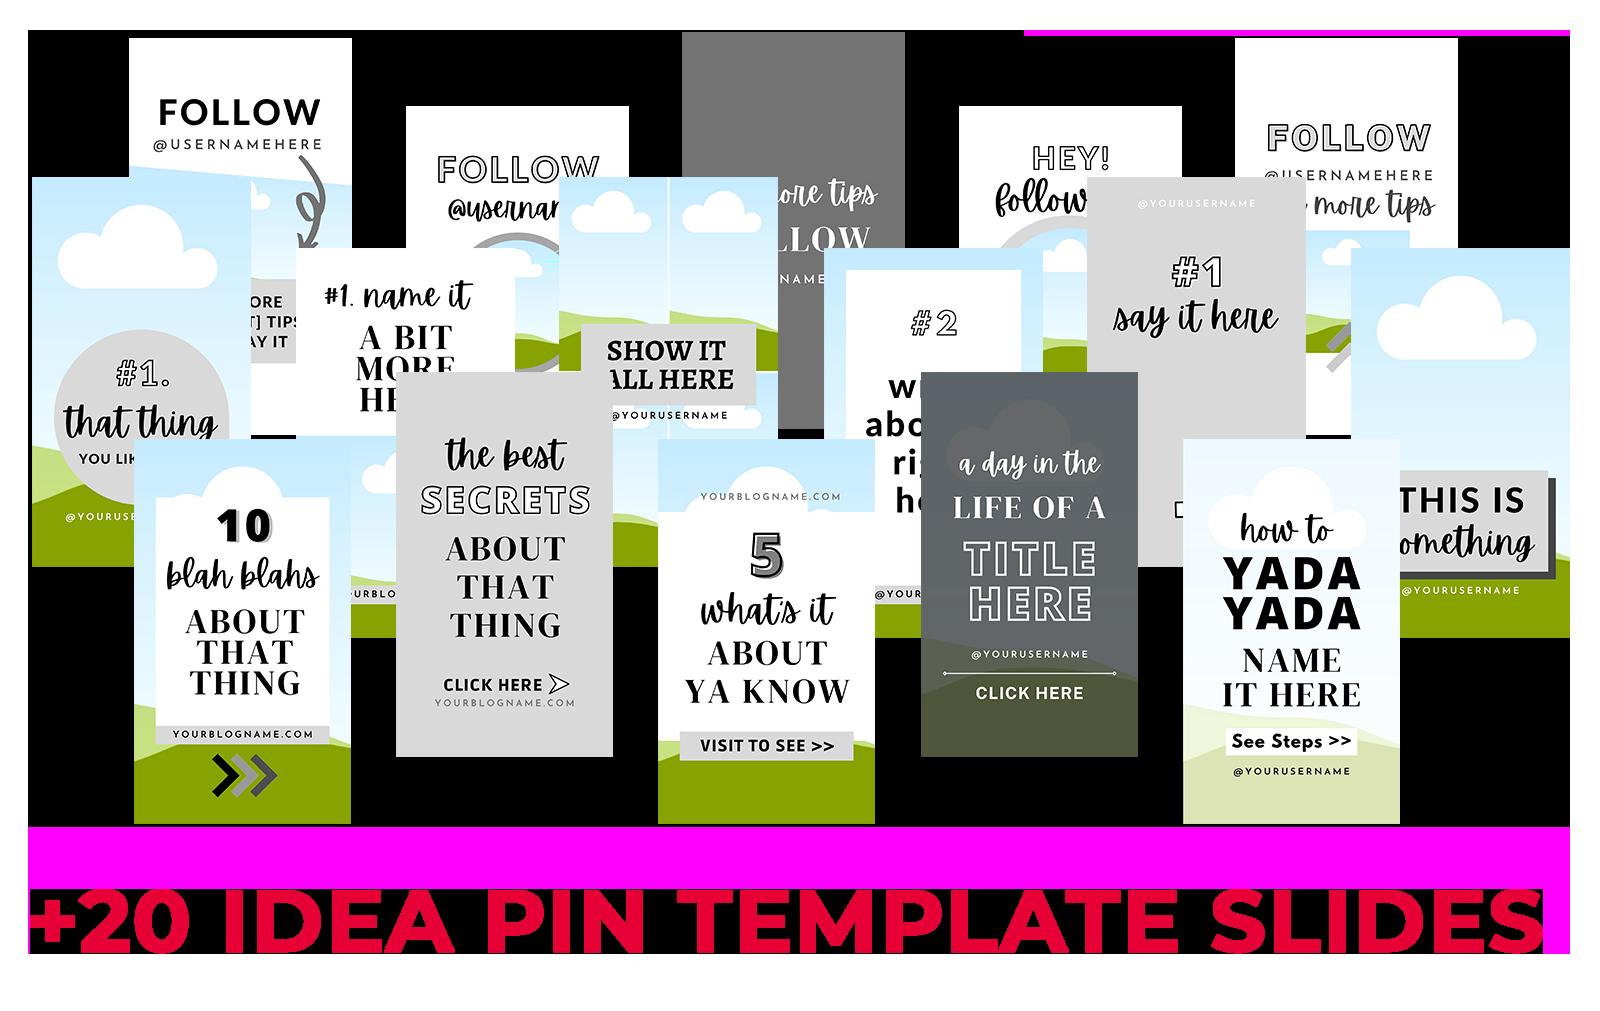 Idea Pin Slide Template Preview